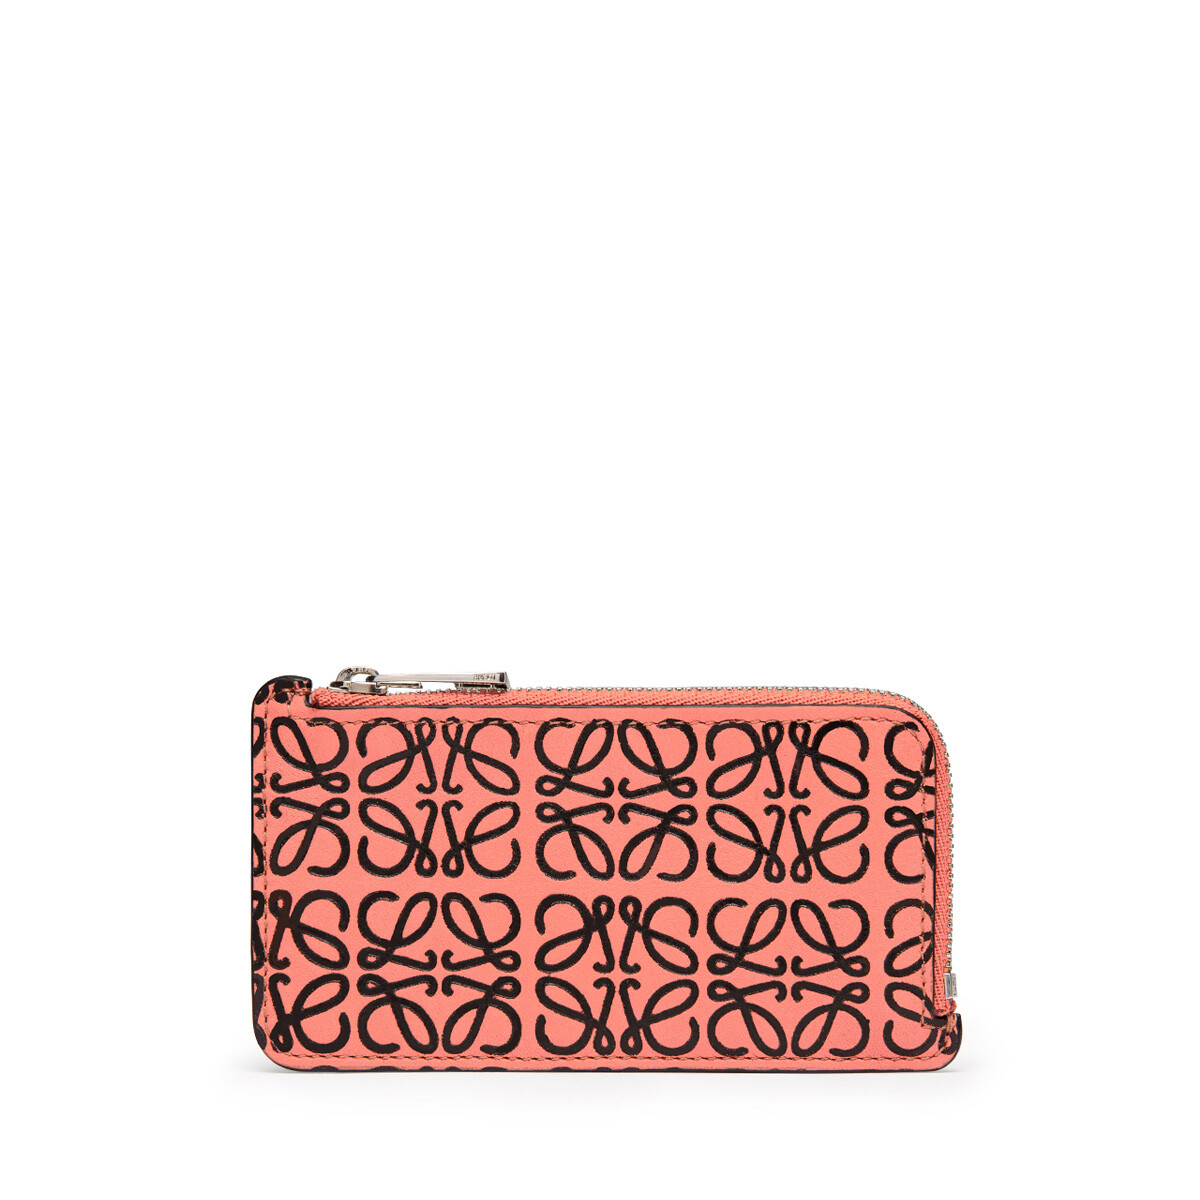 LOEWE Coin/Card Holder Pink Tulip/Black front